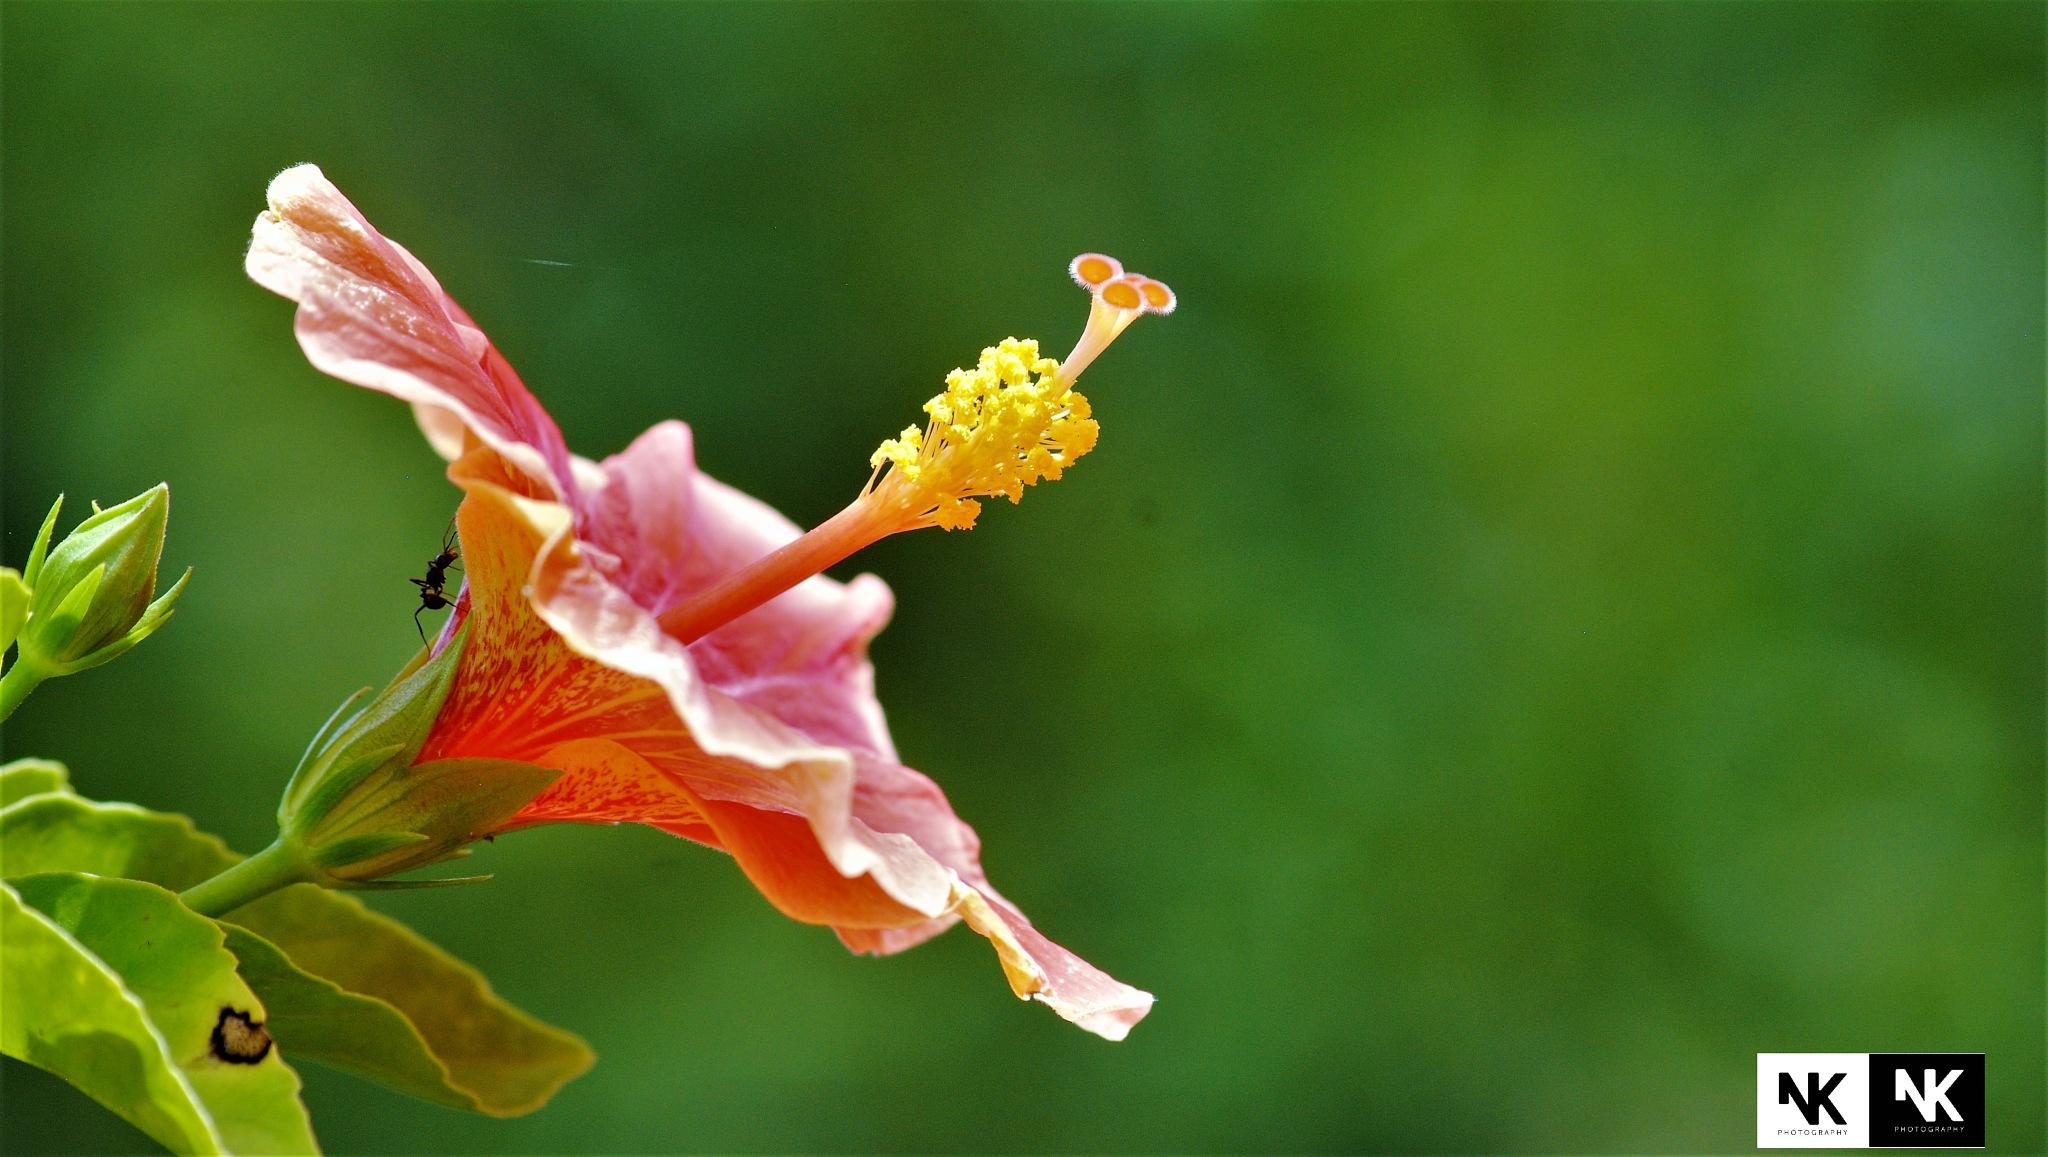 Hibiscus by Nithin Kumar